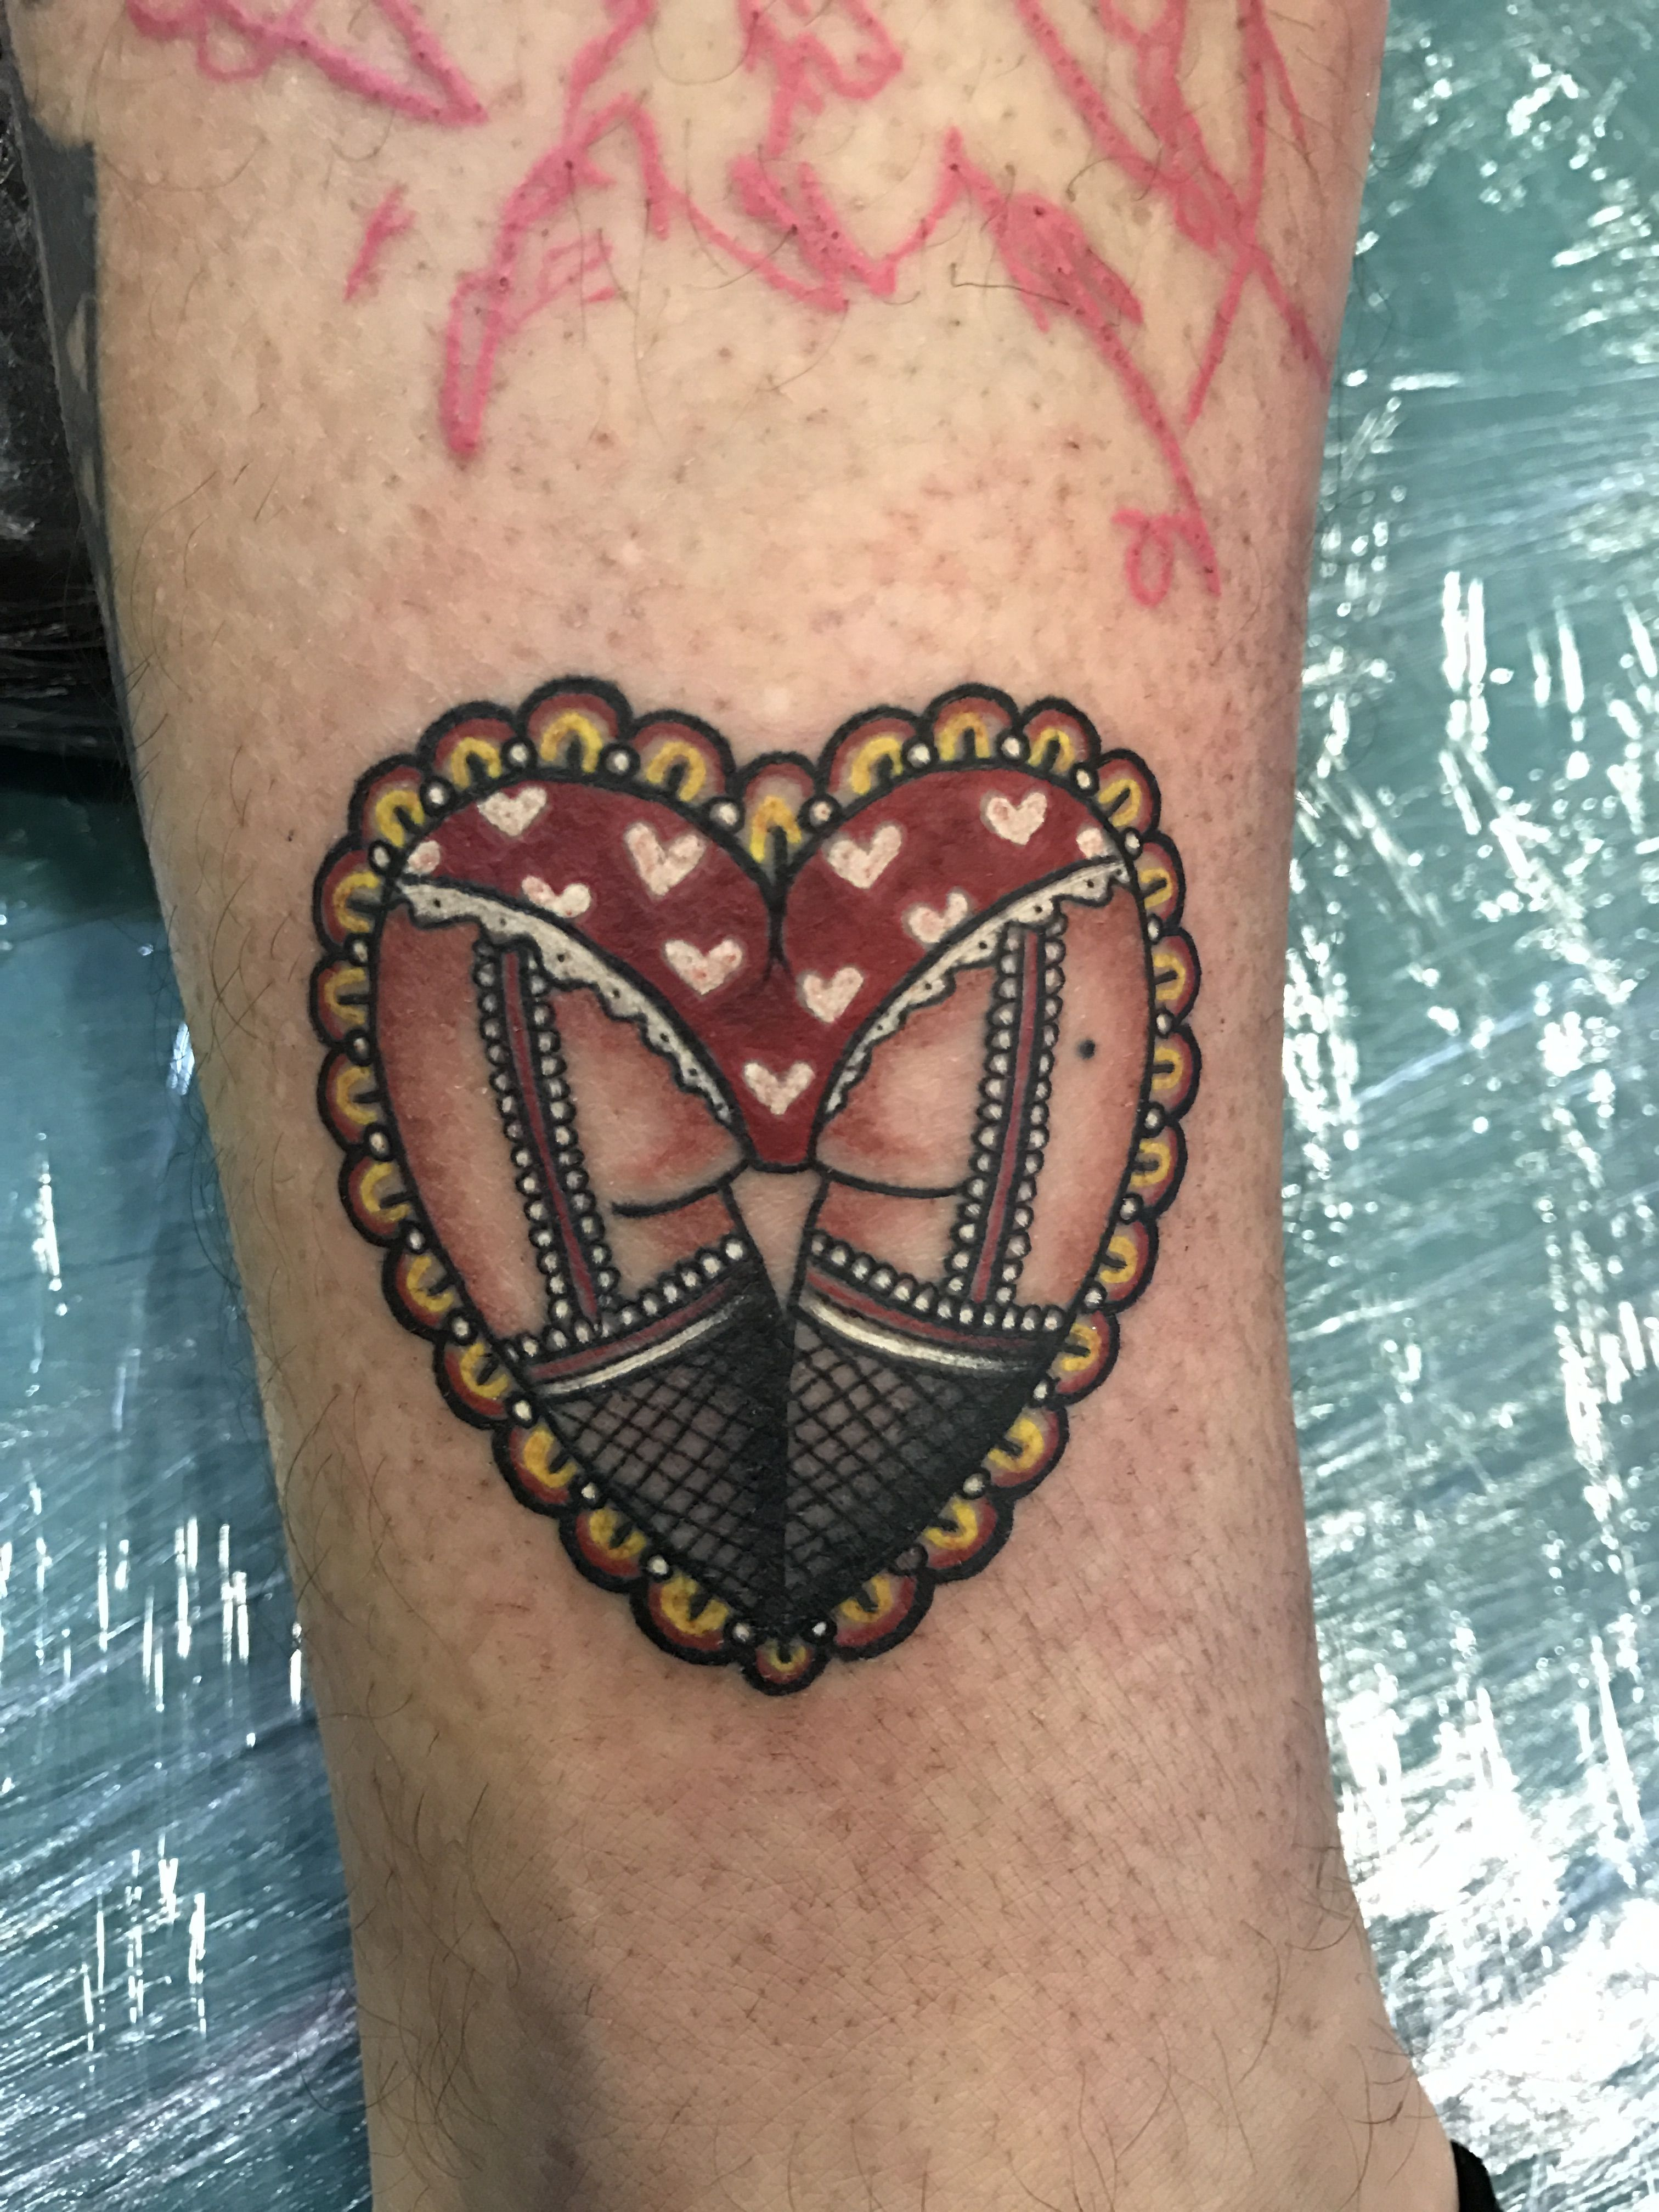 Booty heart tattoo